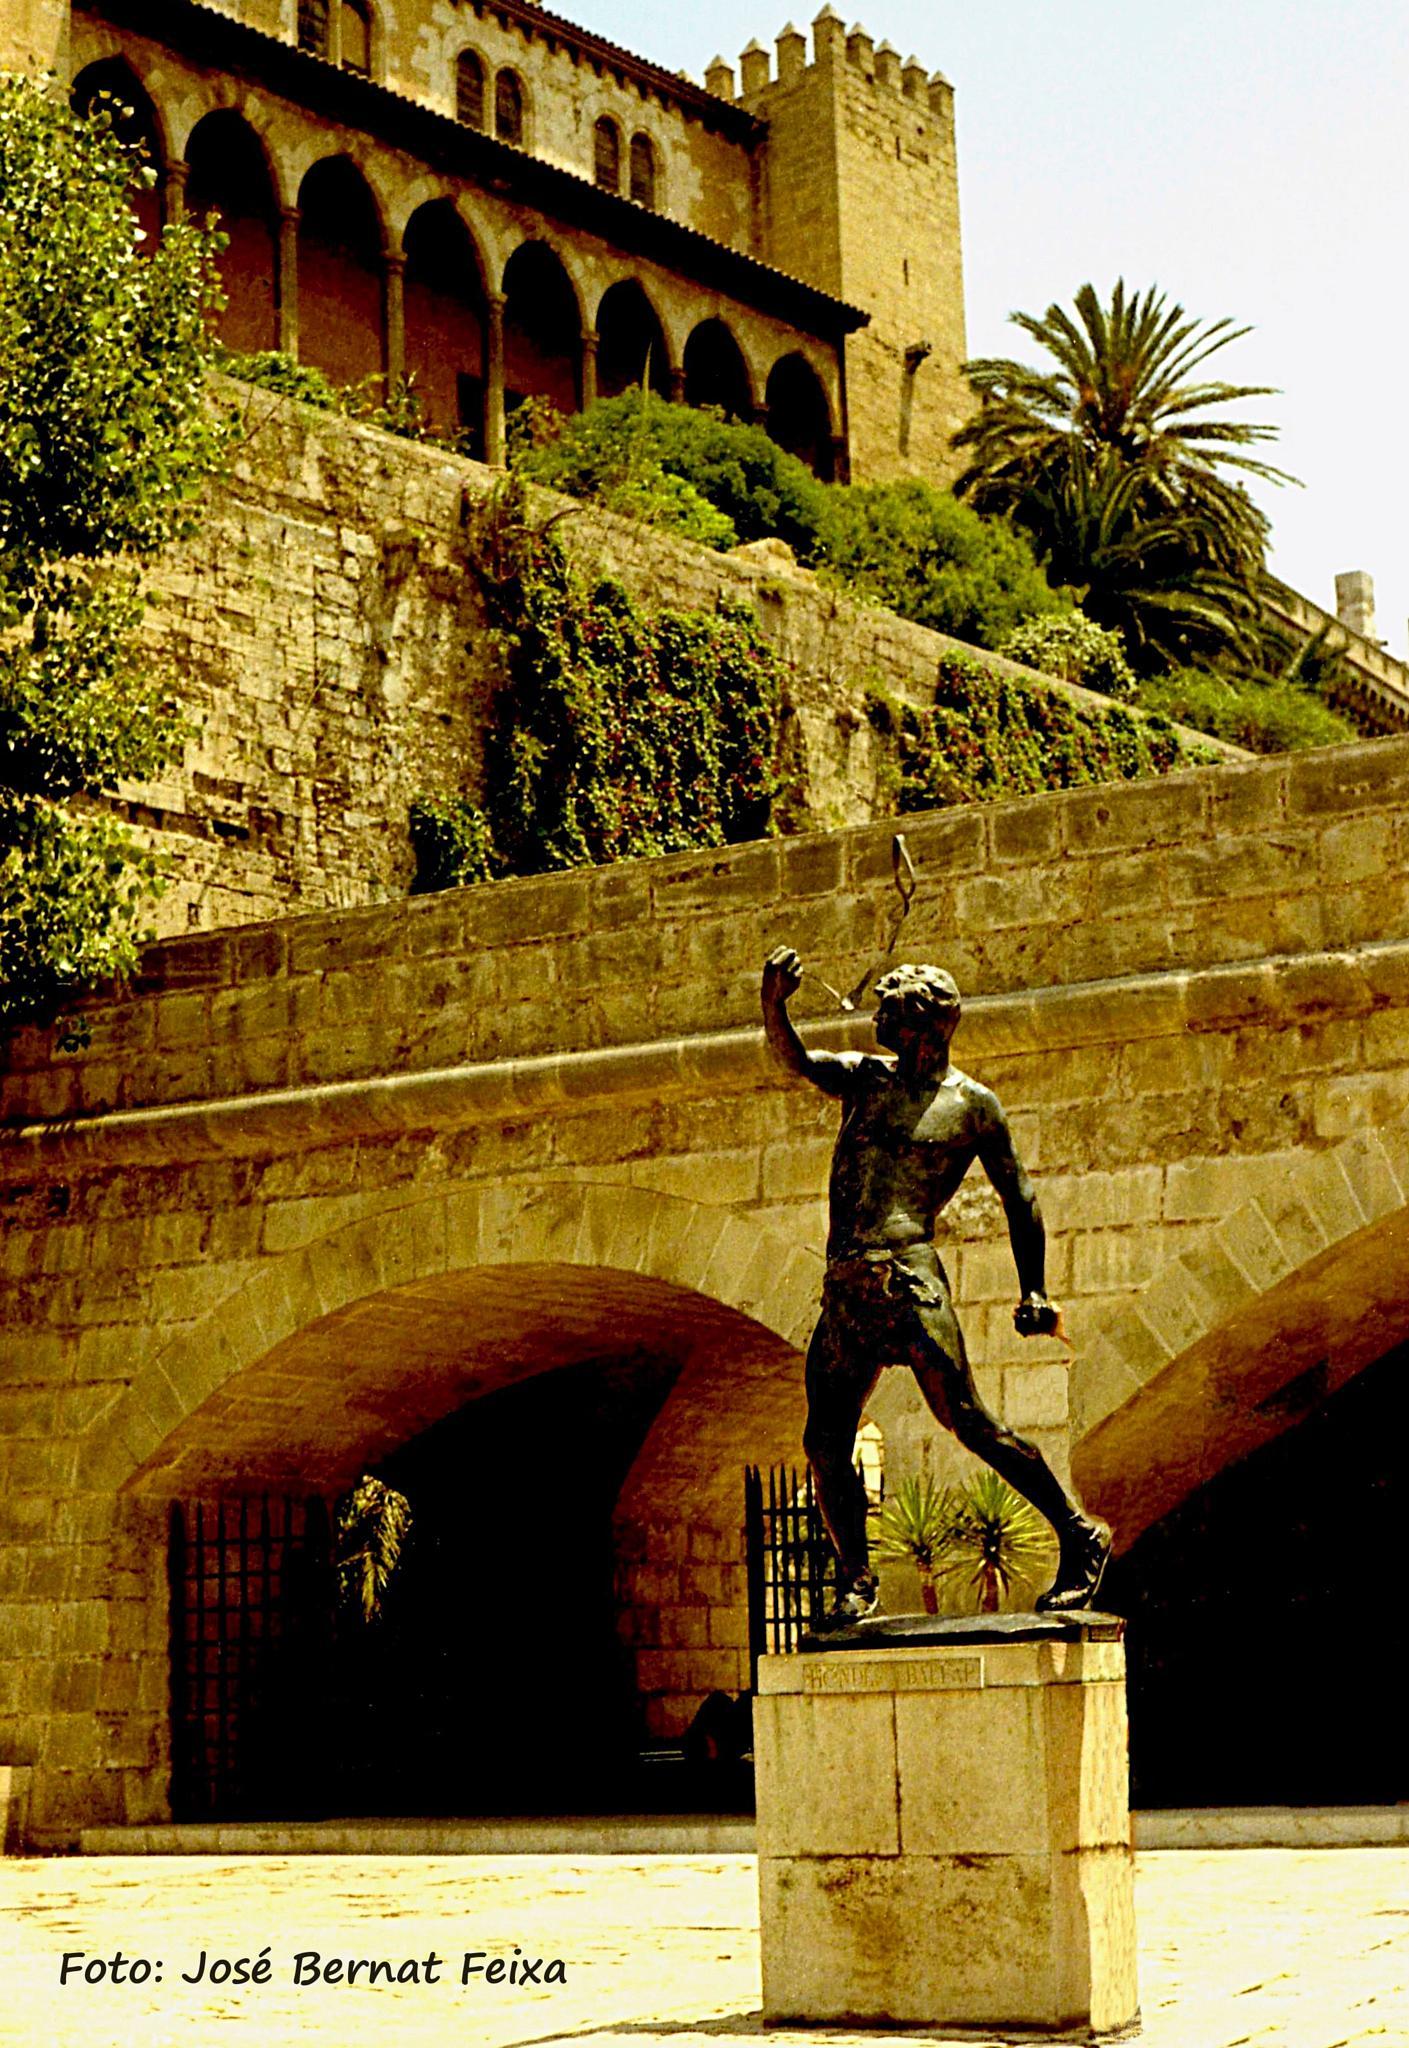 ESTATUA, STANDBEELD, STATUE, Mallorca (1973) by José Bernat Feixa